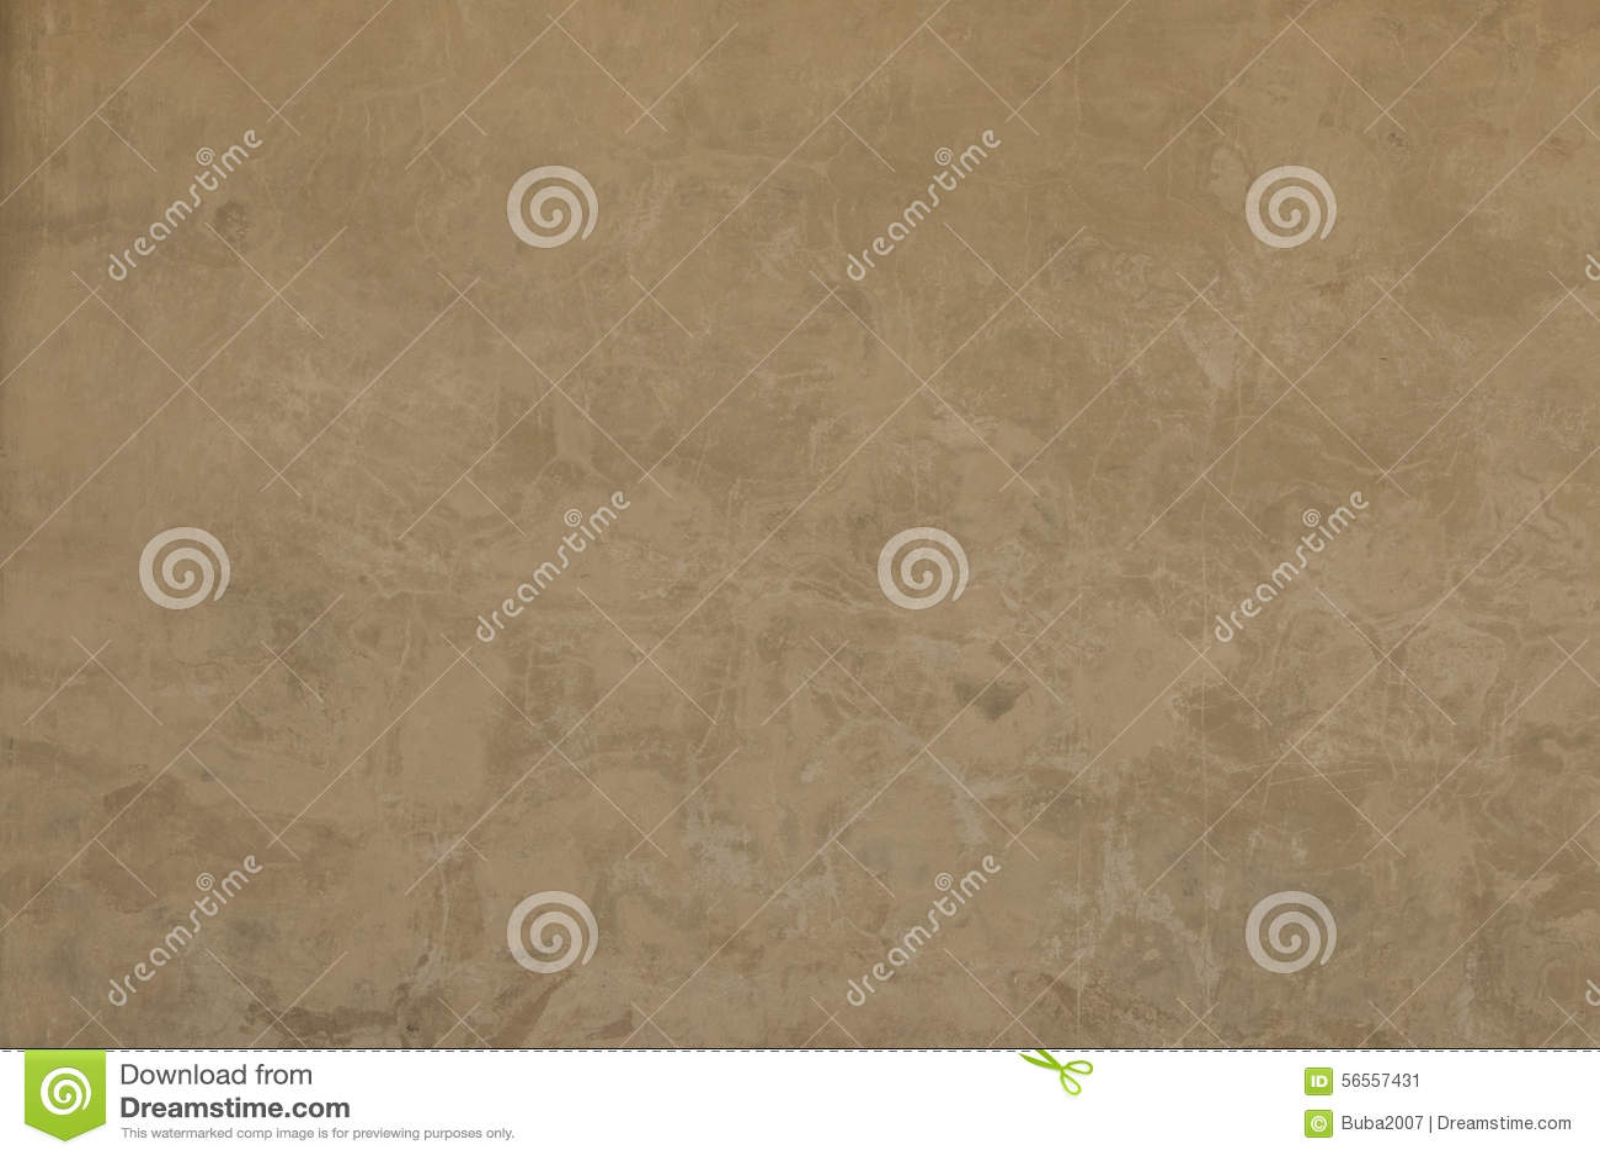 Download Υπόβαθρο - παλαιός τοίχος ασβεστοκονιάματος Στοκ Εικόνα - εικόνα από προγεφυρωμάτων, κλείστε: 56557431